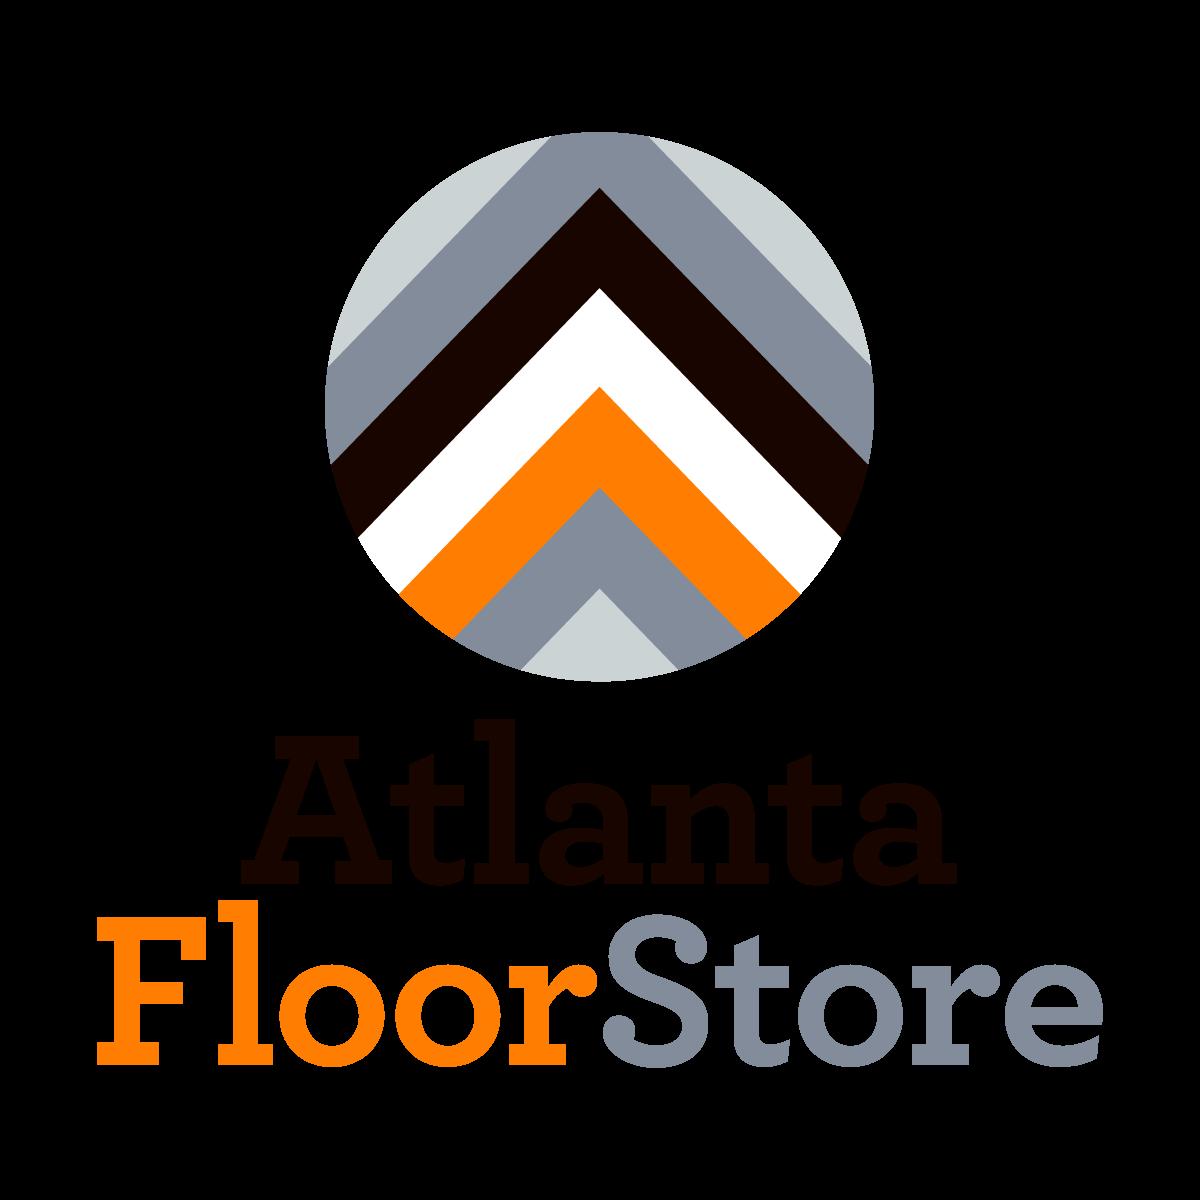 The Atlanta Floor Store - 3740 Dekalb Technology Pkwy Ste B Atlanta, GA 30340